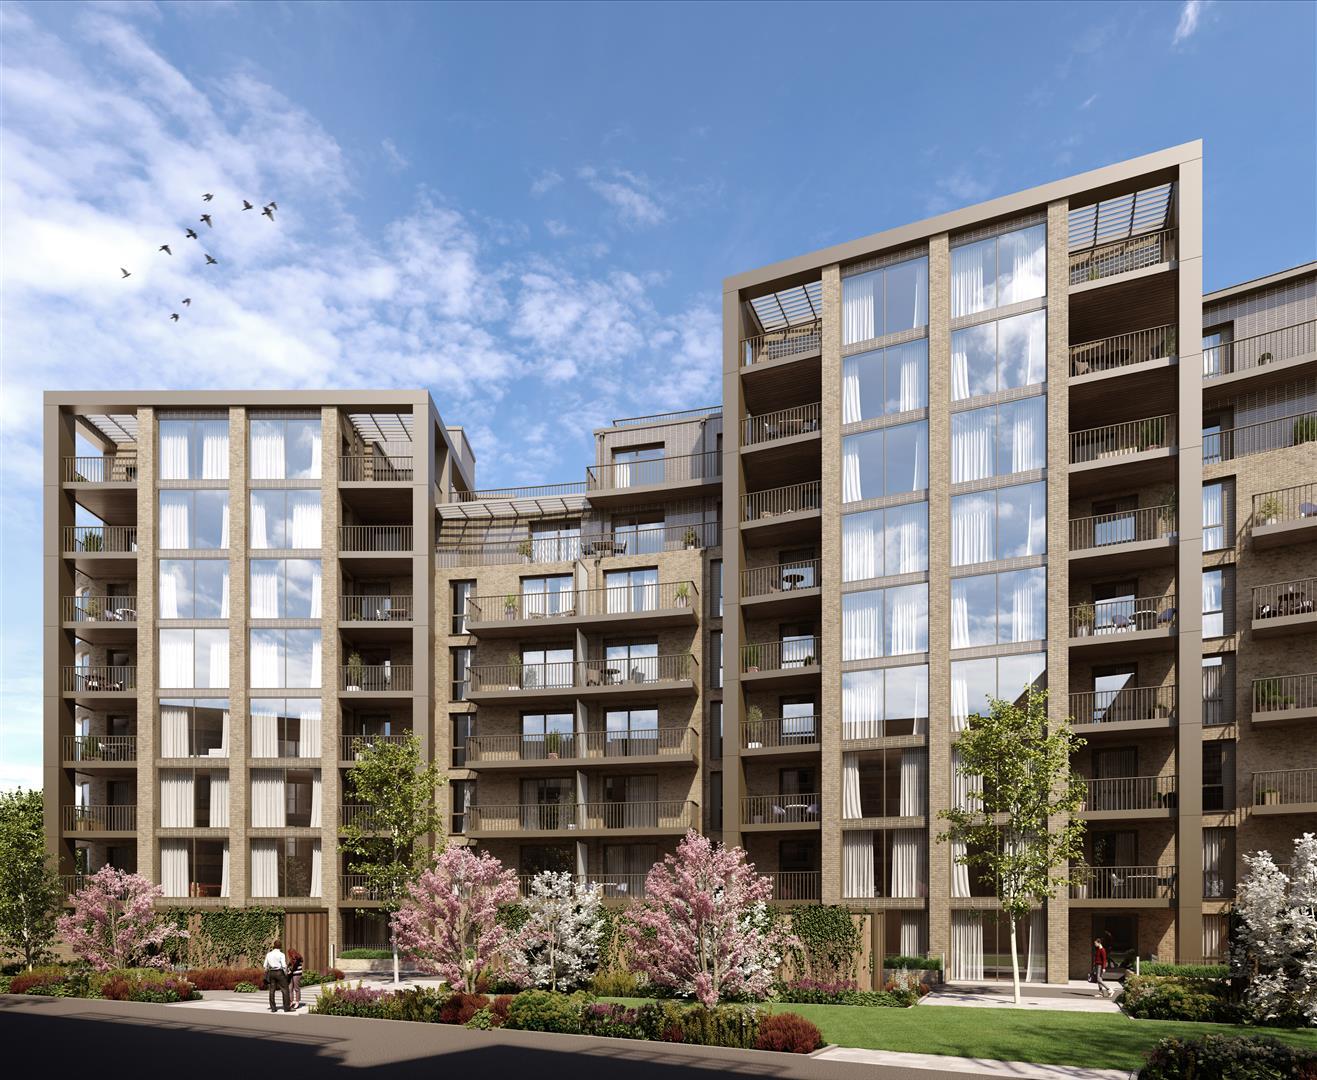 2 Bedroom Flat For Sale In Betjeman Court Bentinck Road Yiewsley West Drayton Ub7 London